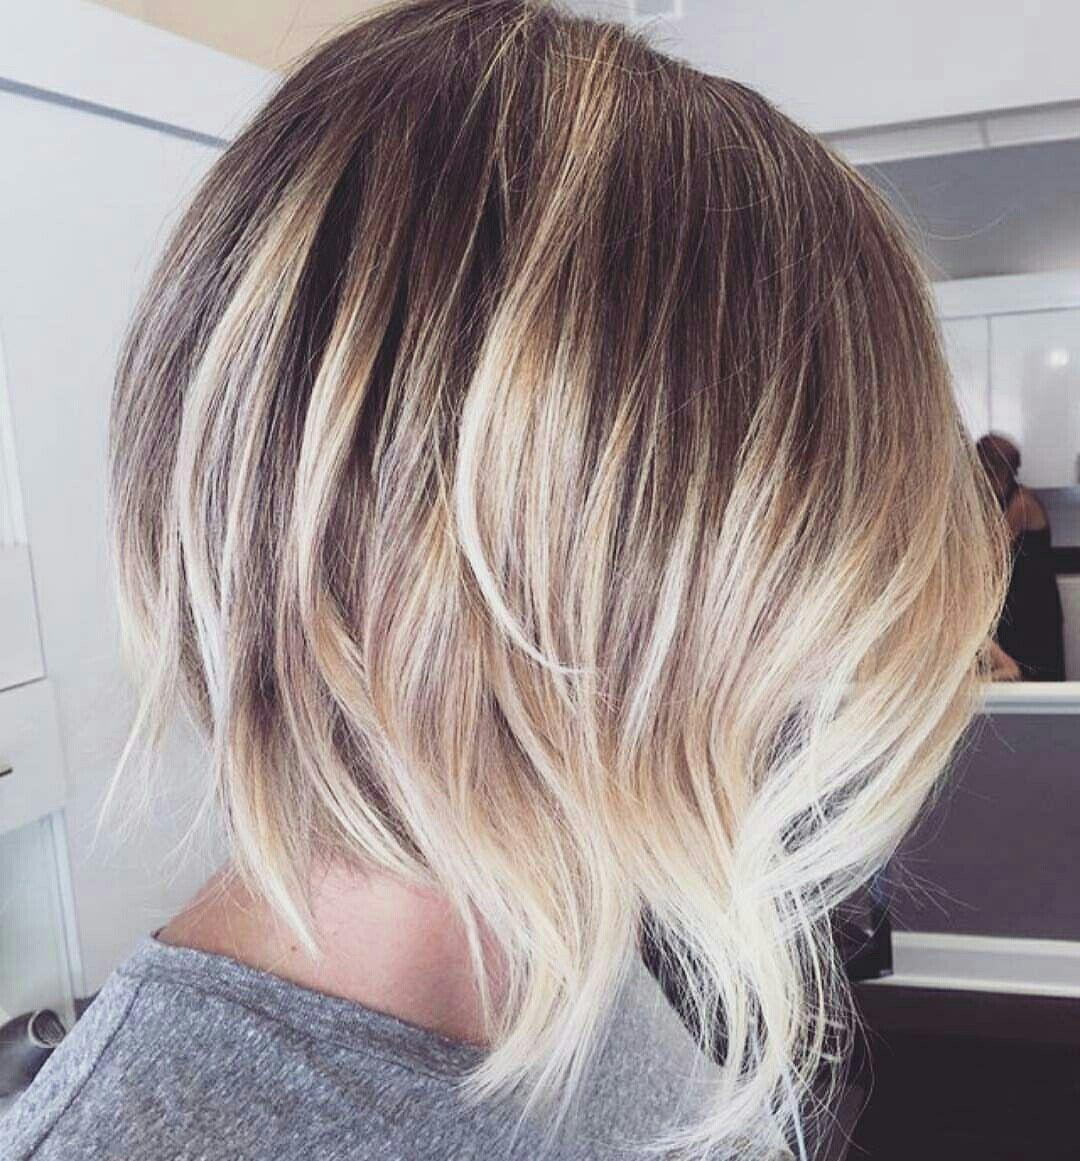 Pin By Paulha On Fryzury Pinterest Hair Style Bob Cut And Bobs